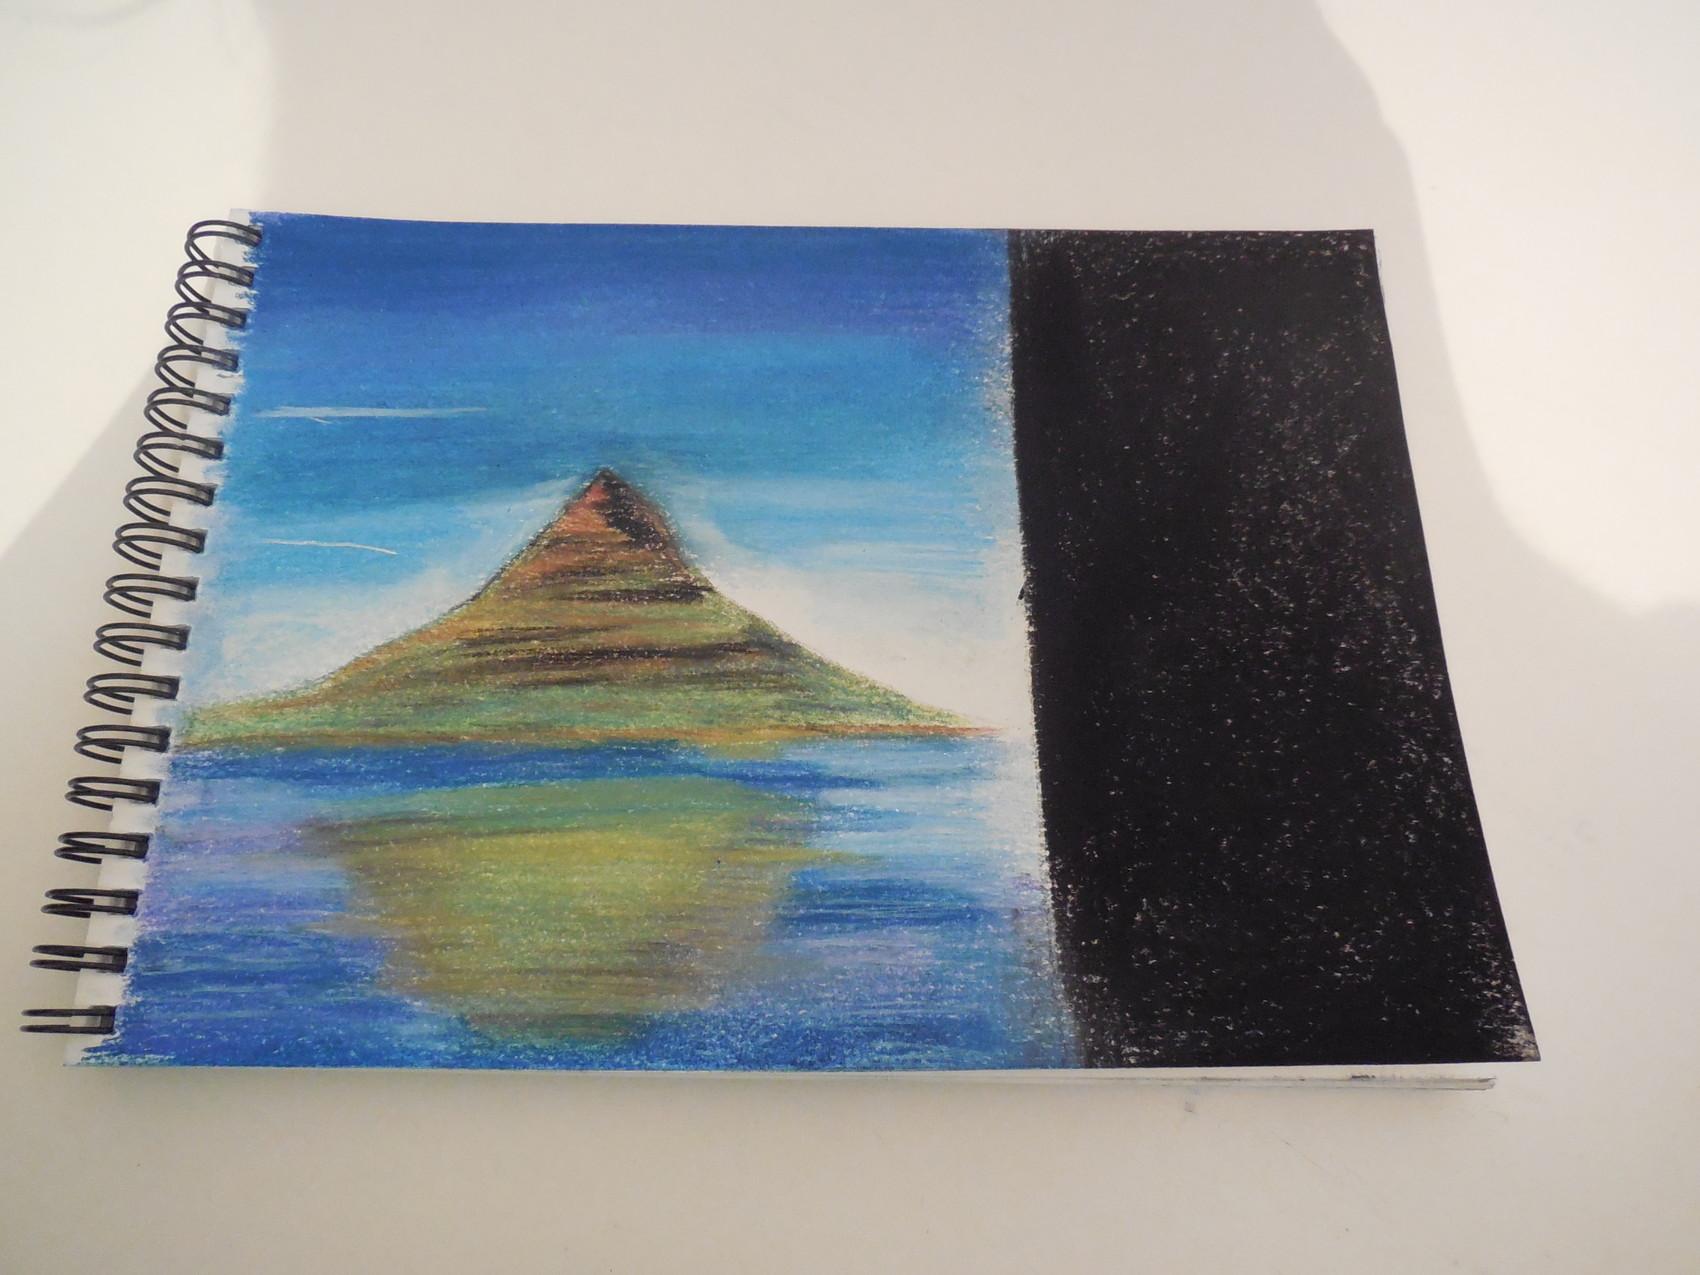 Peinture premier essai au pastel sec - Peinture au pastel sec ...